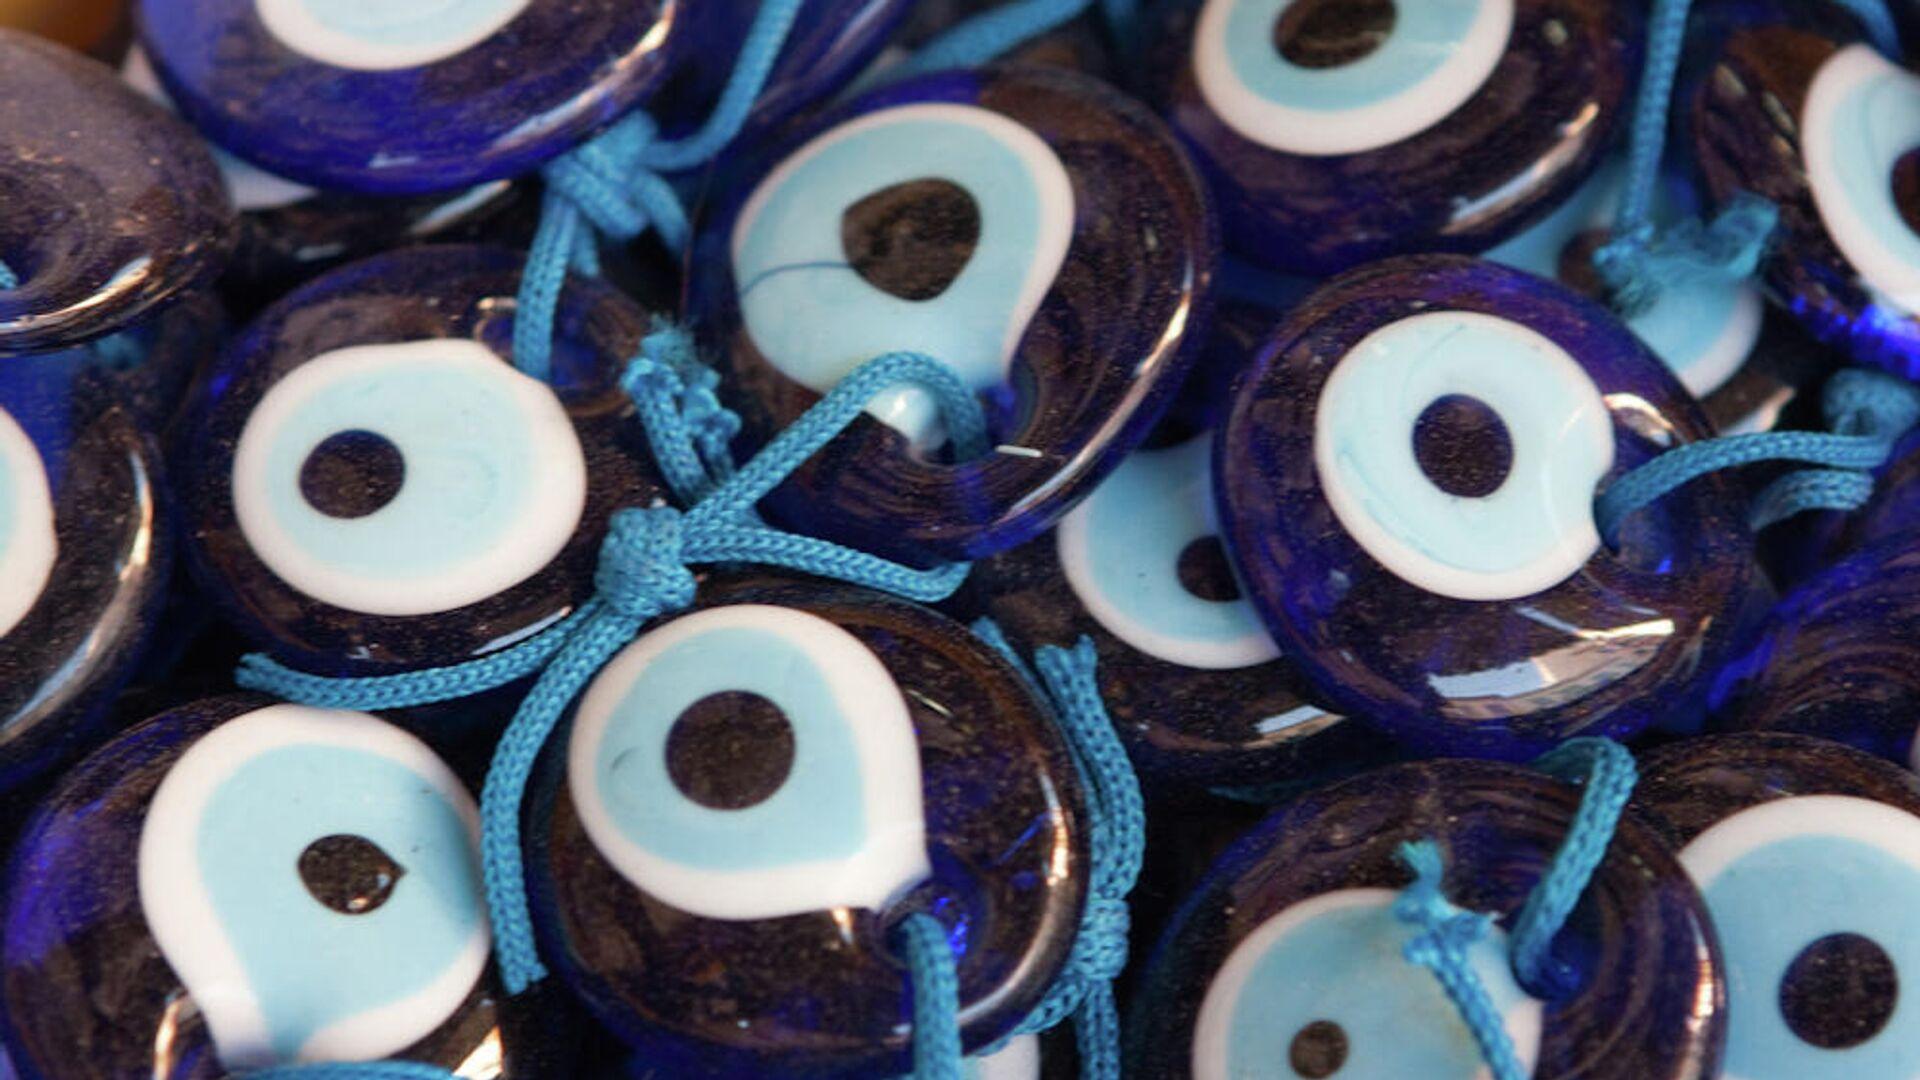 Un ojo hecho de cristal azul, amulet que protege del mal de ojo - Sputnik Mundo, 1920, 26.05.2021